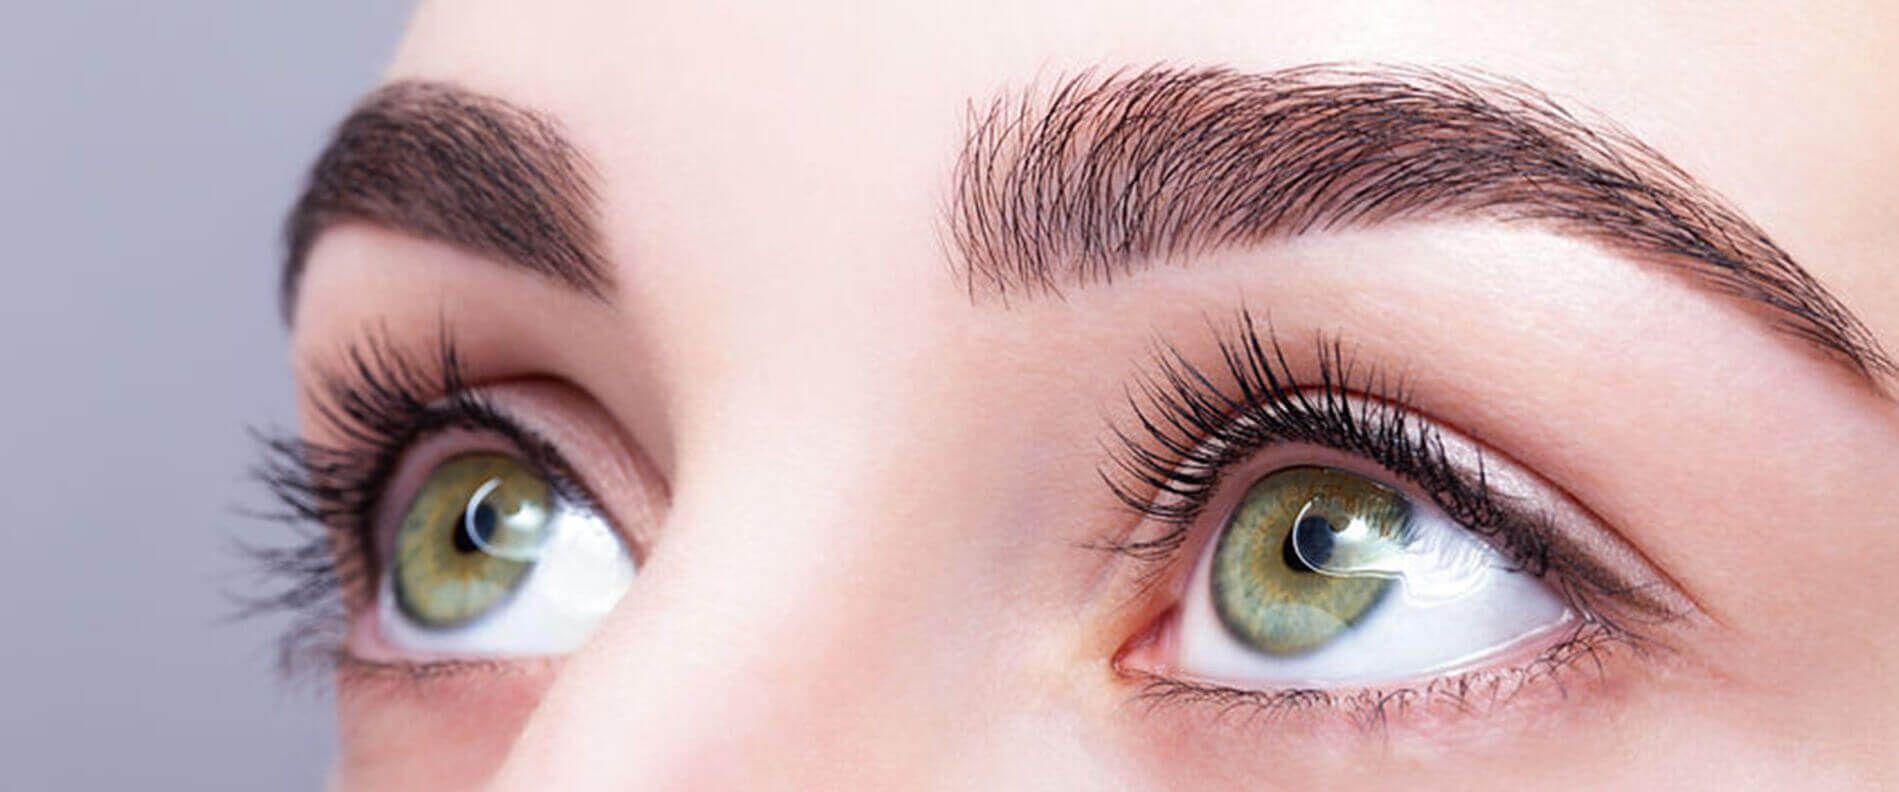 Soft permanent eyeliner